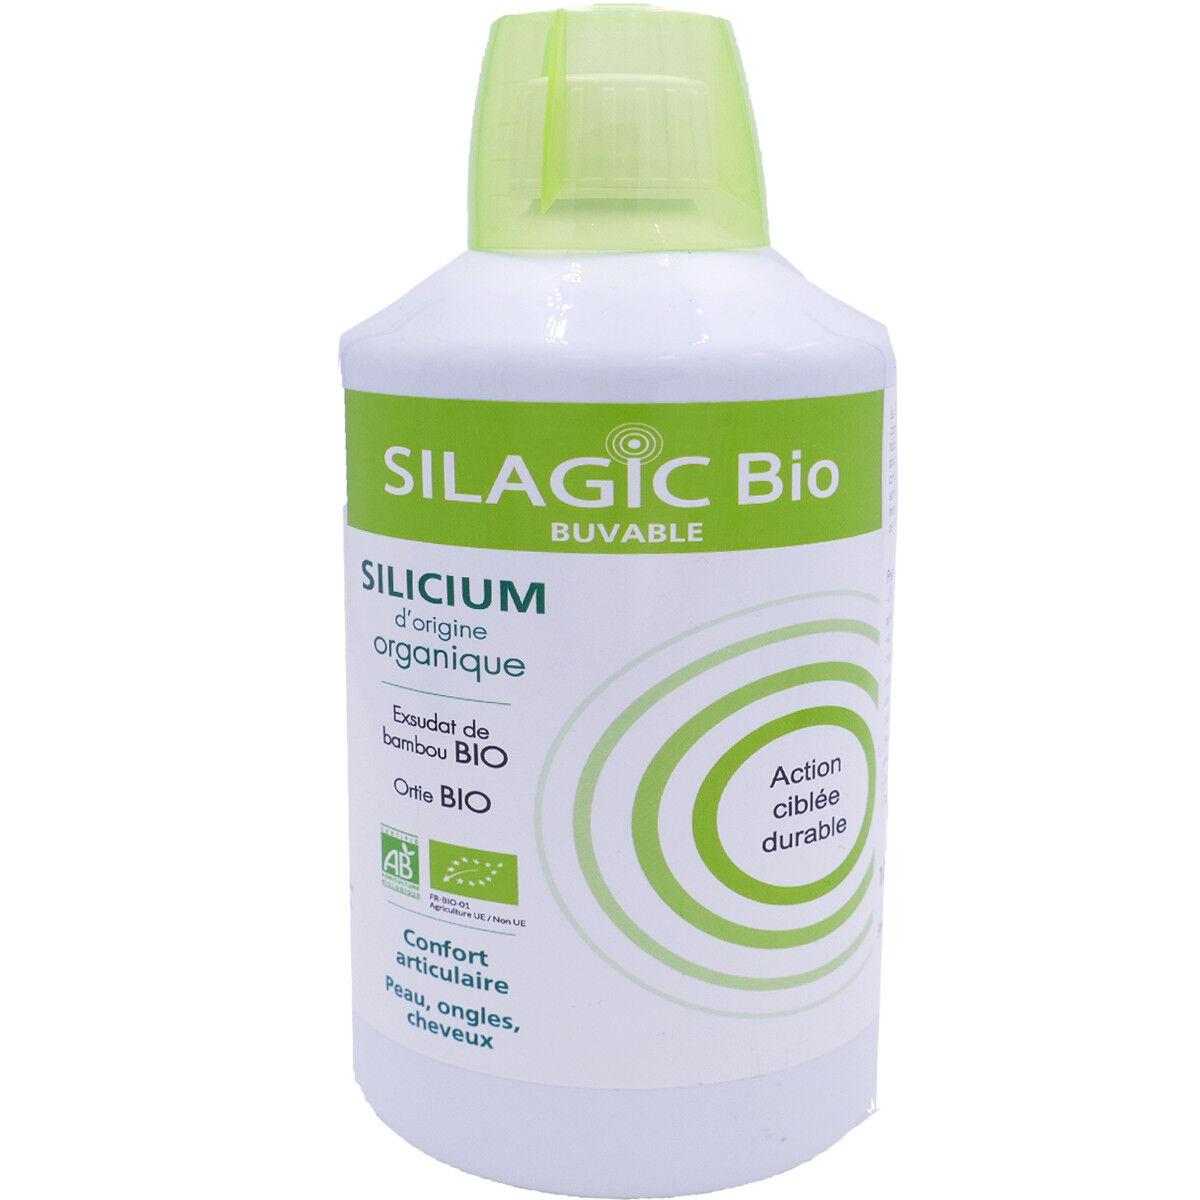 PHARM UP Silagic bio buvable silicium 1l bio